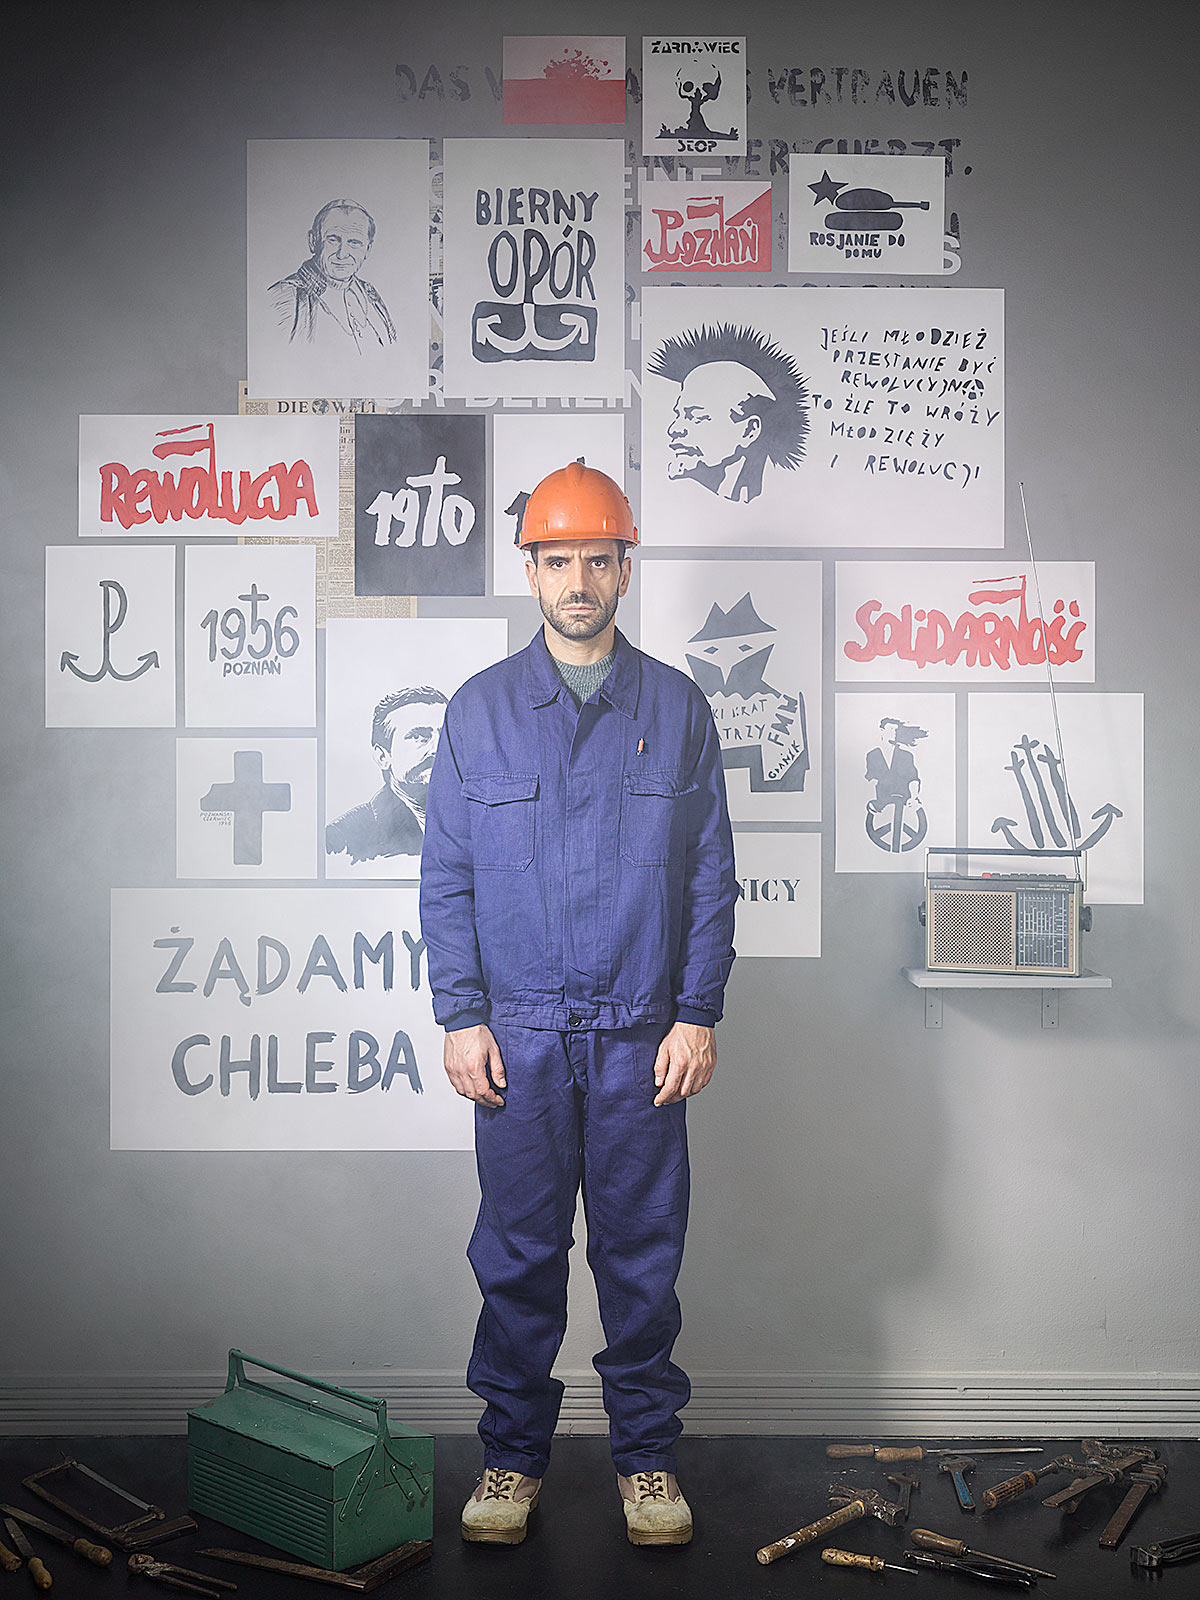 Polonia 1980-1989 (2019) - Roberto Aguirrezabala